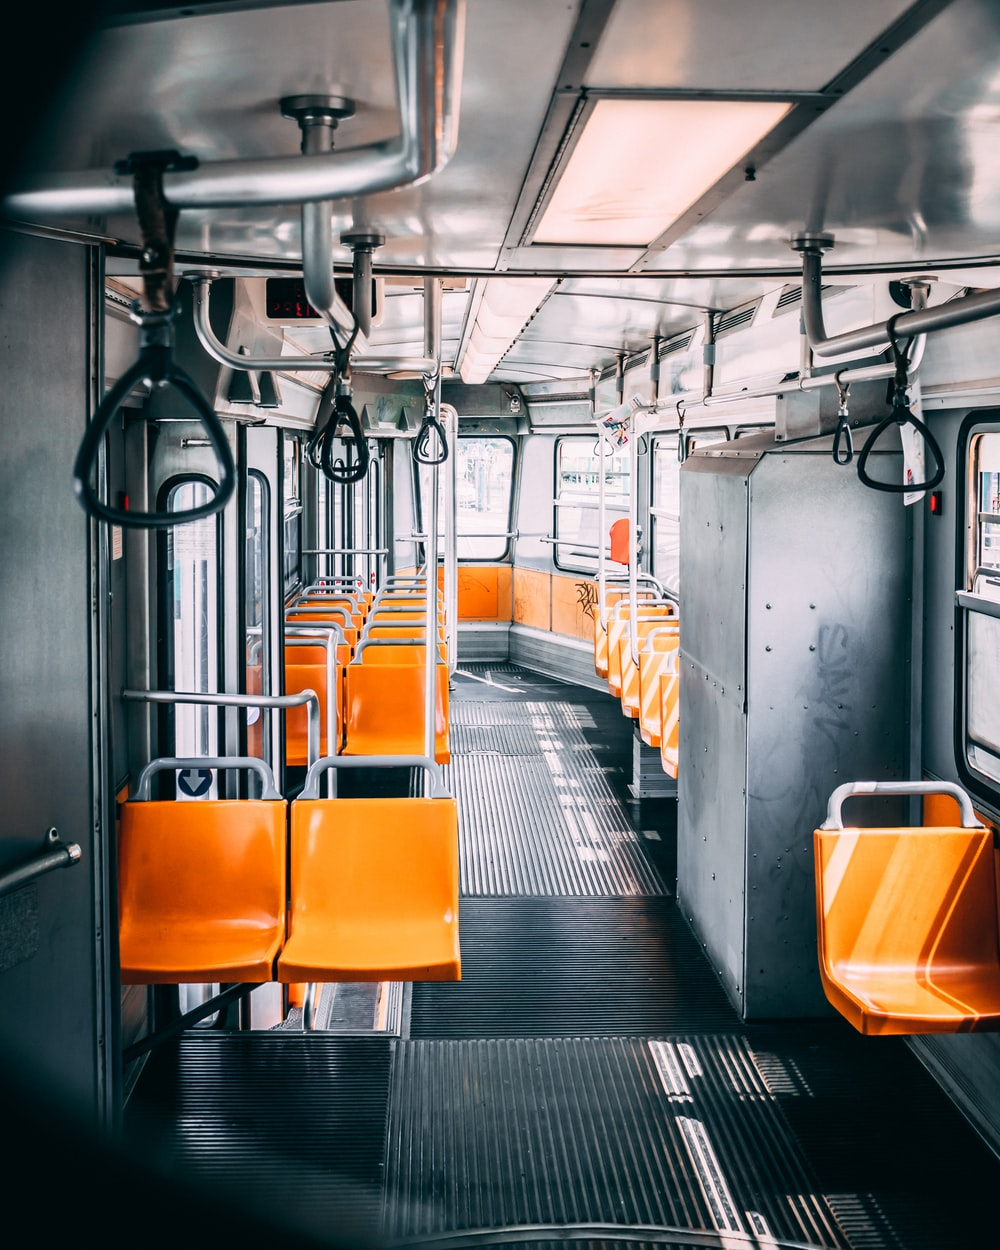 orange and gray train seats